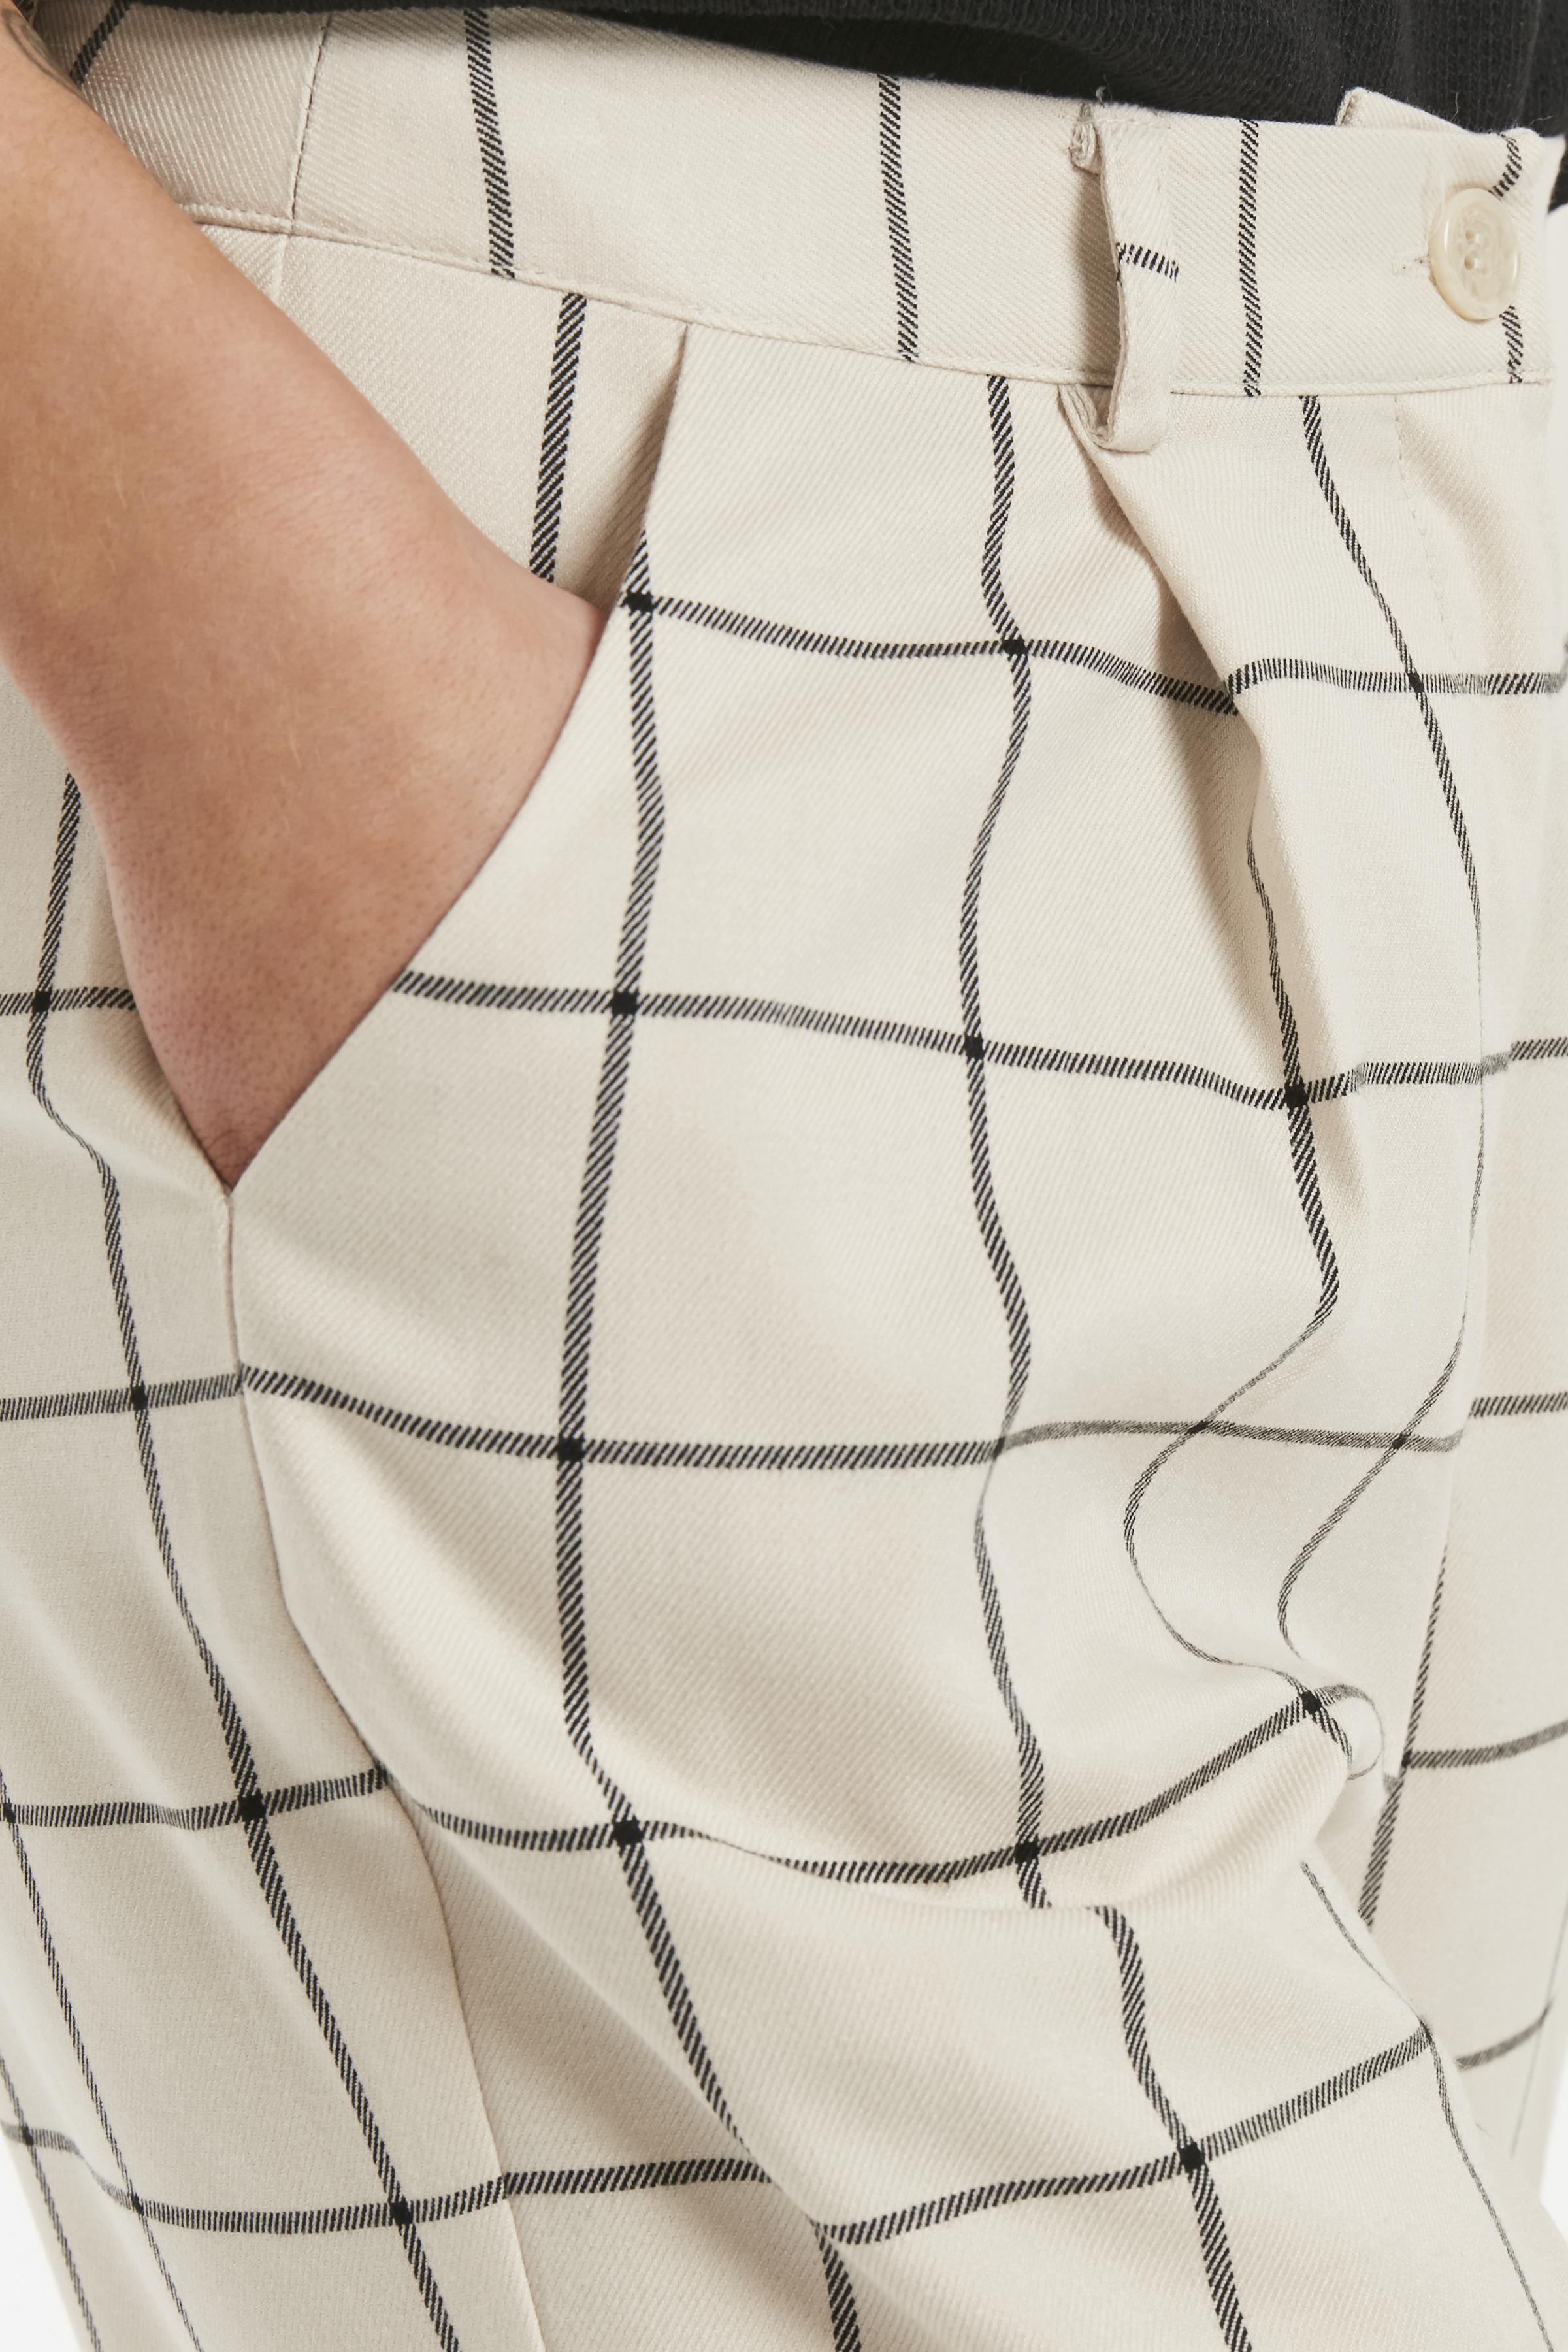 MLG Sandshell Pants Casual – Køb MLG Sandshell Pants Casual fra str. 34-42 her